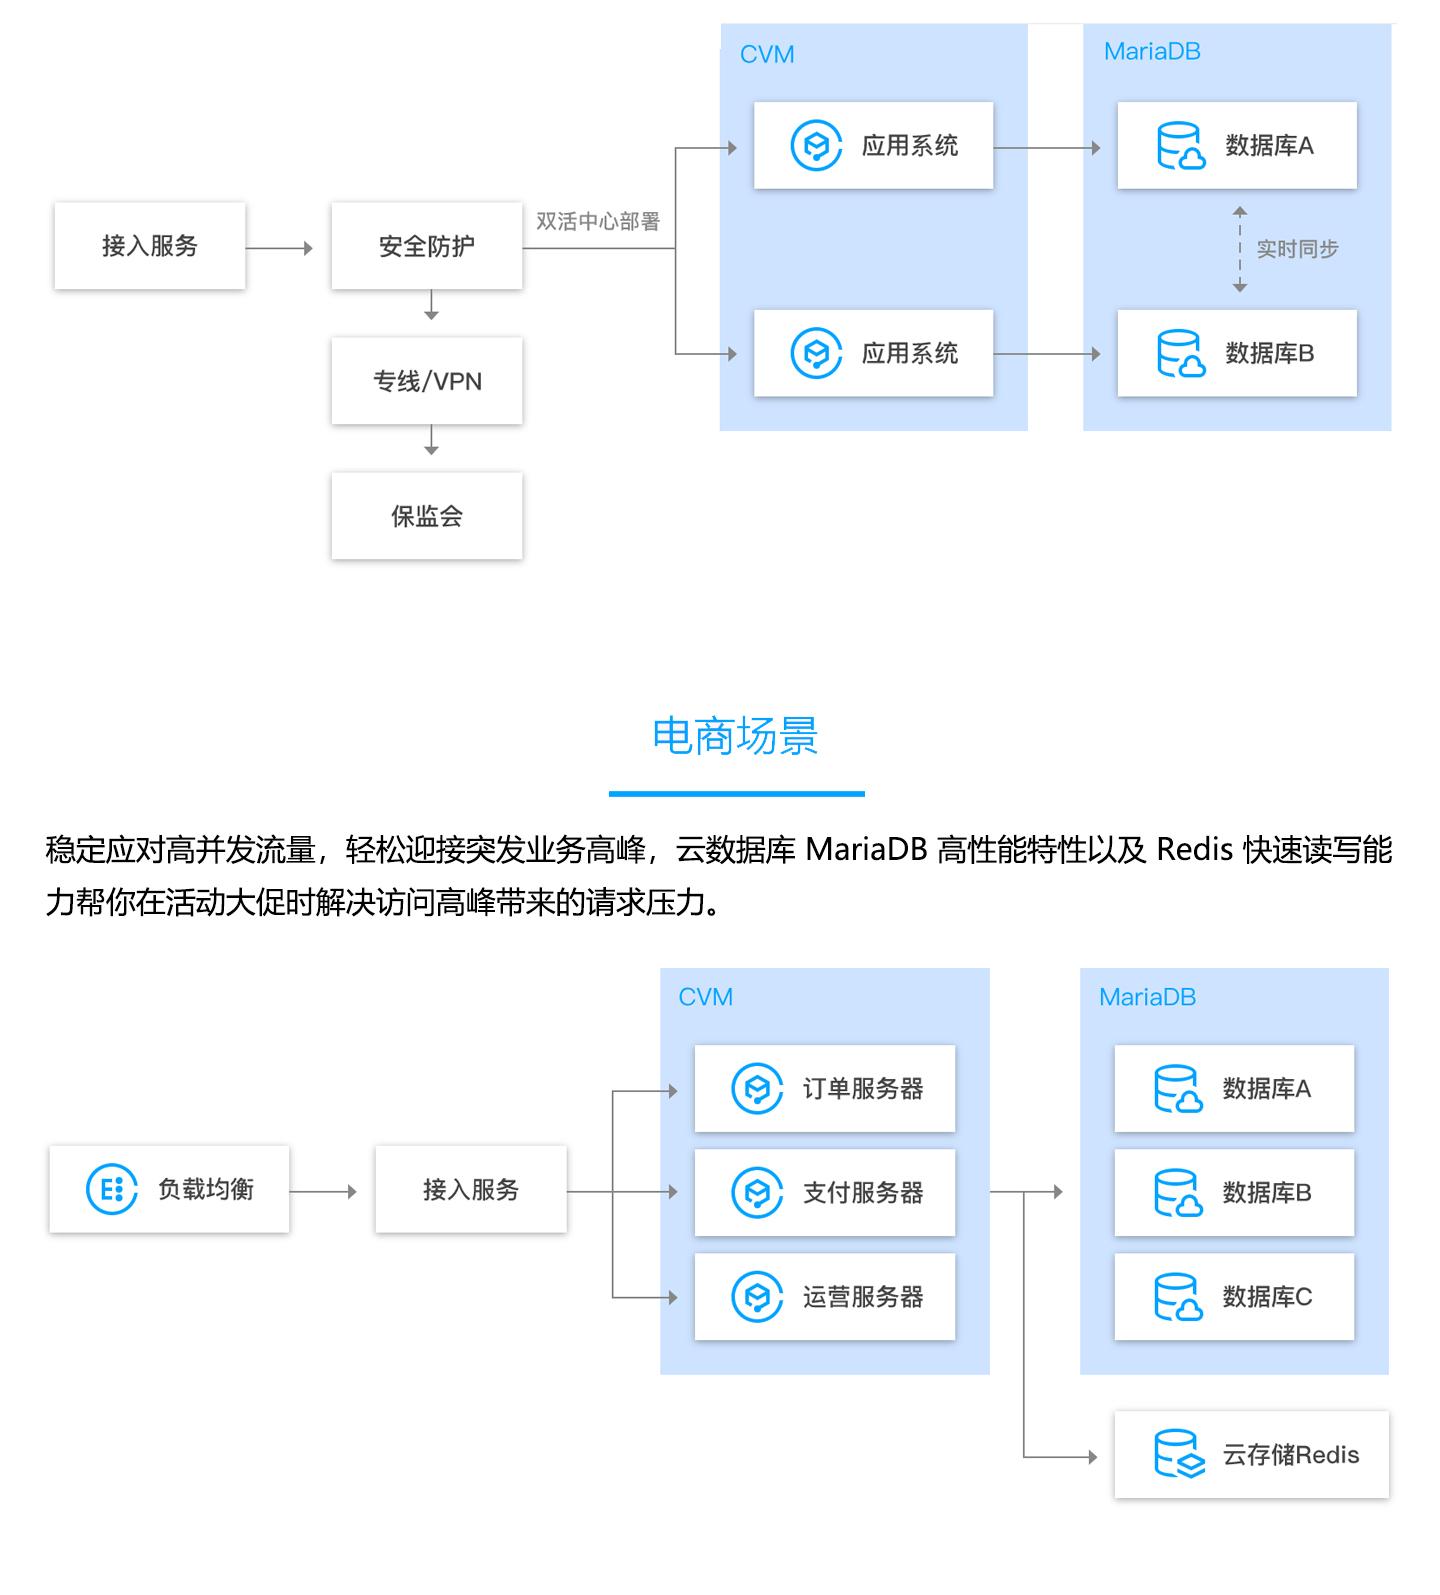 云数据库-TencentDB-for-MariaDB-1440_04.jpg